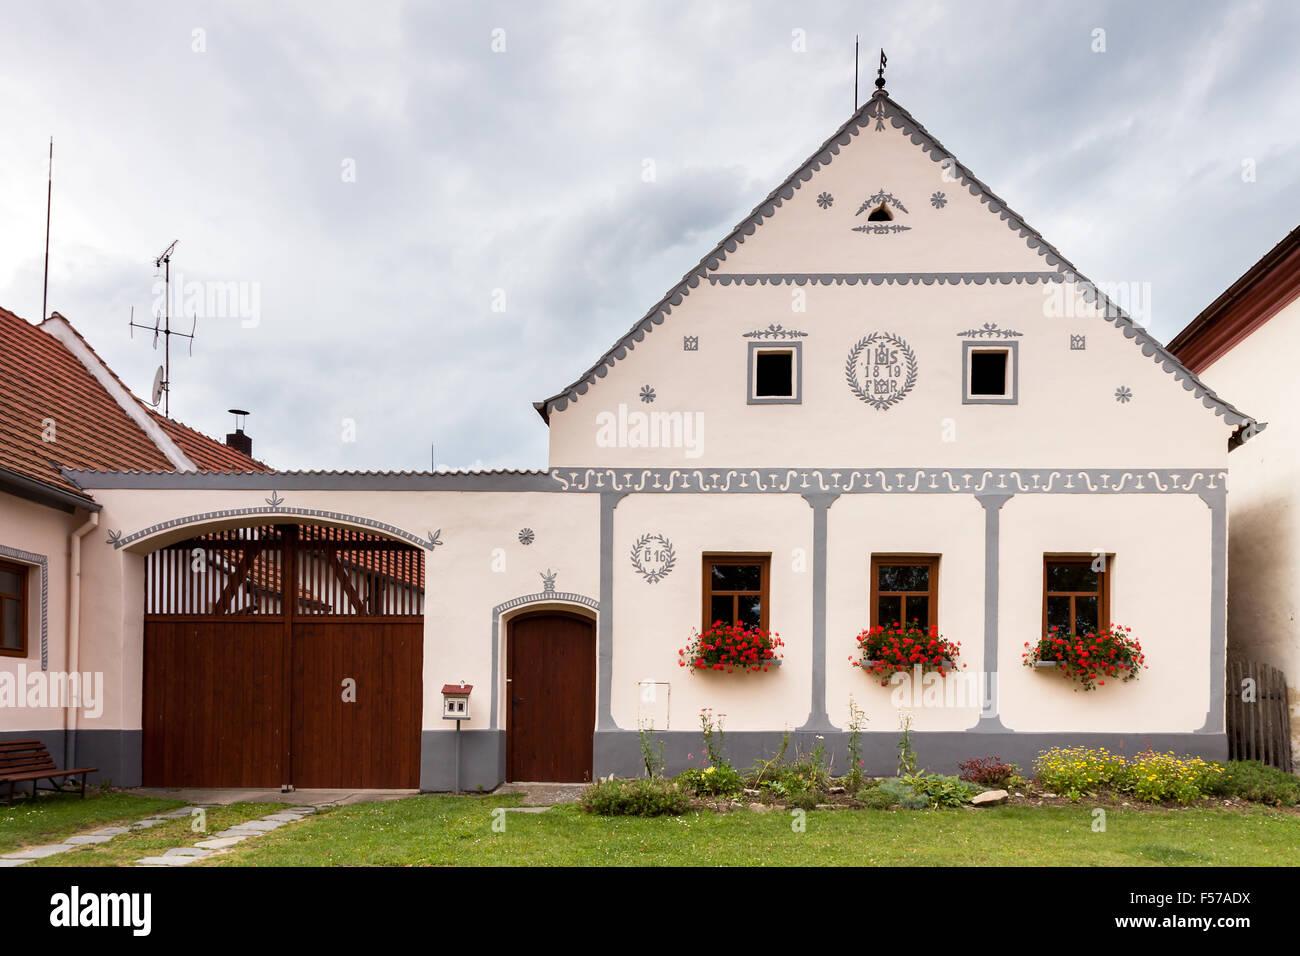 Czech Republic - UNESCO village Holasovice in South Bohemia - Stock Image